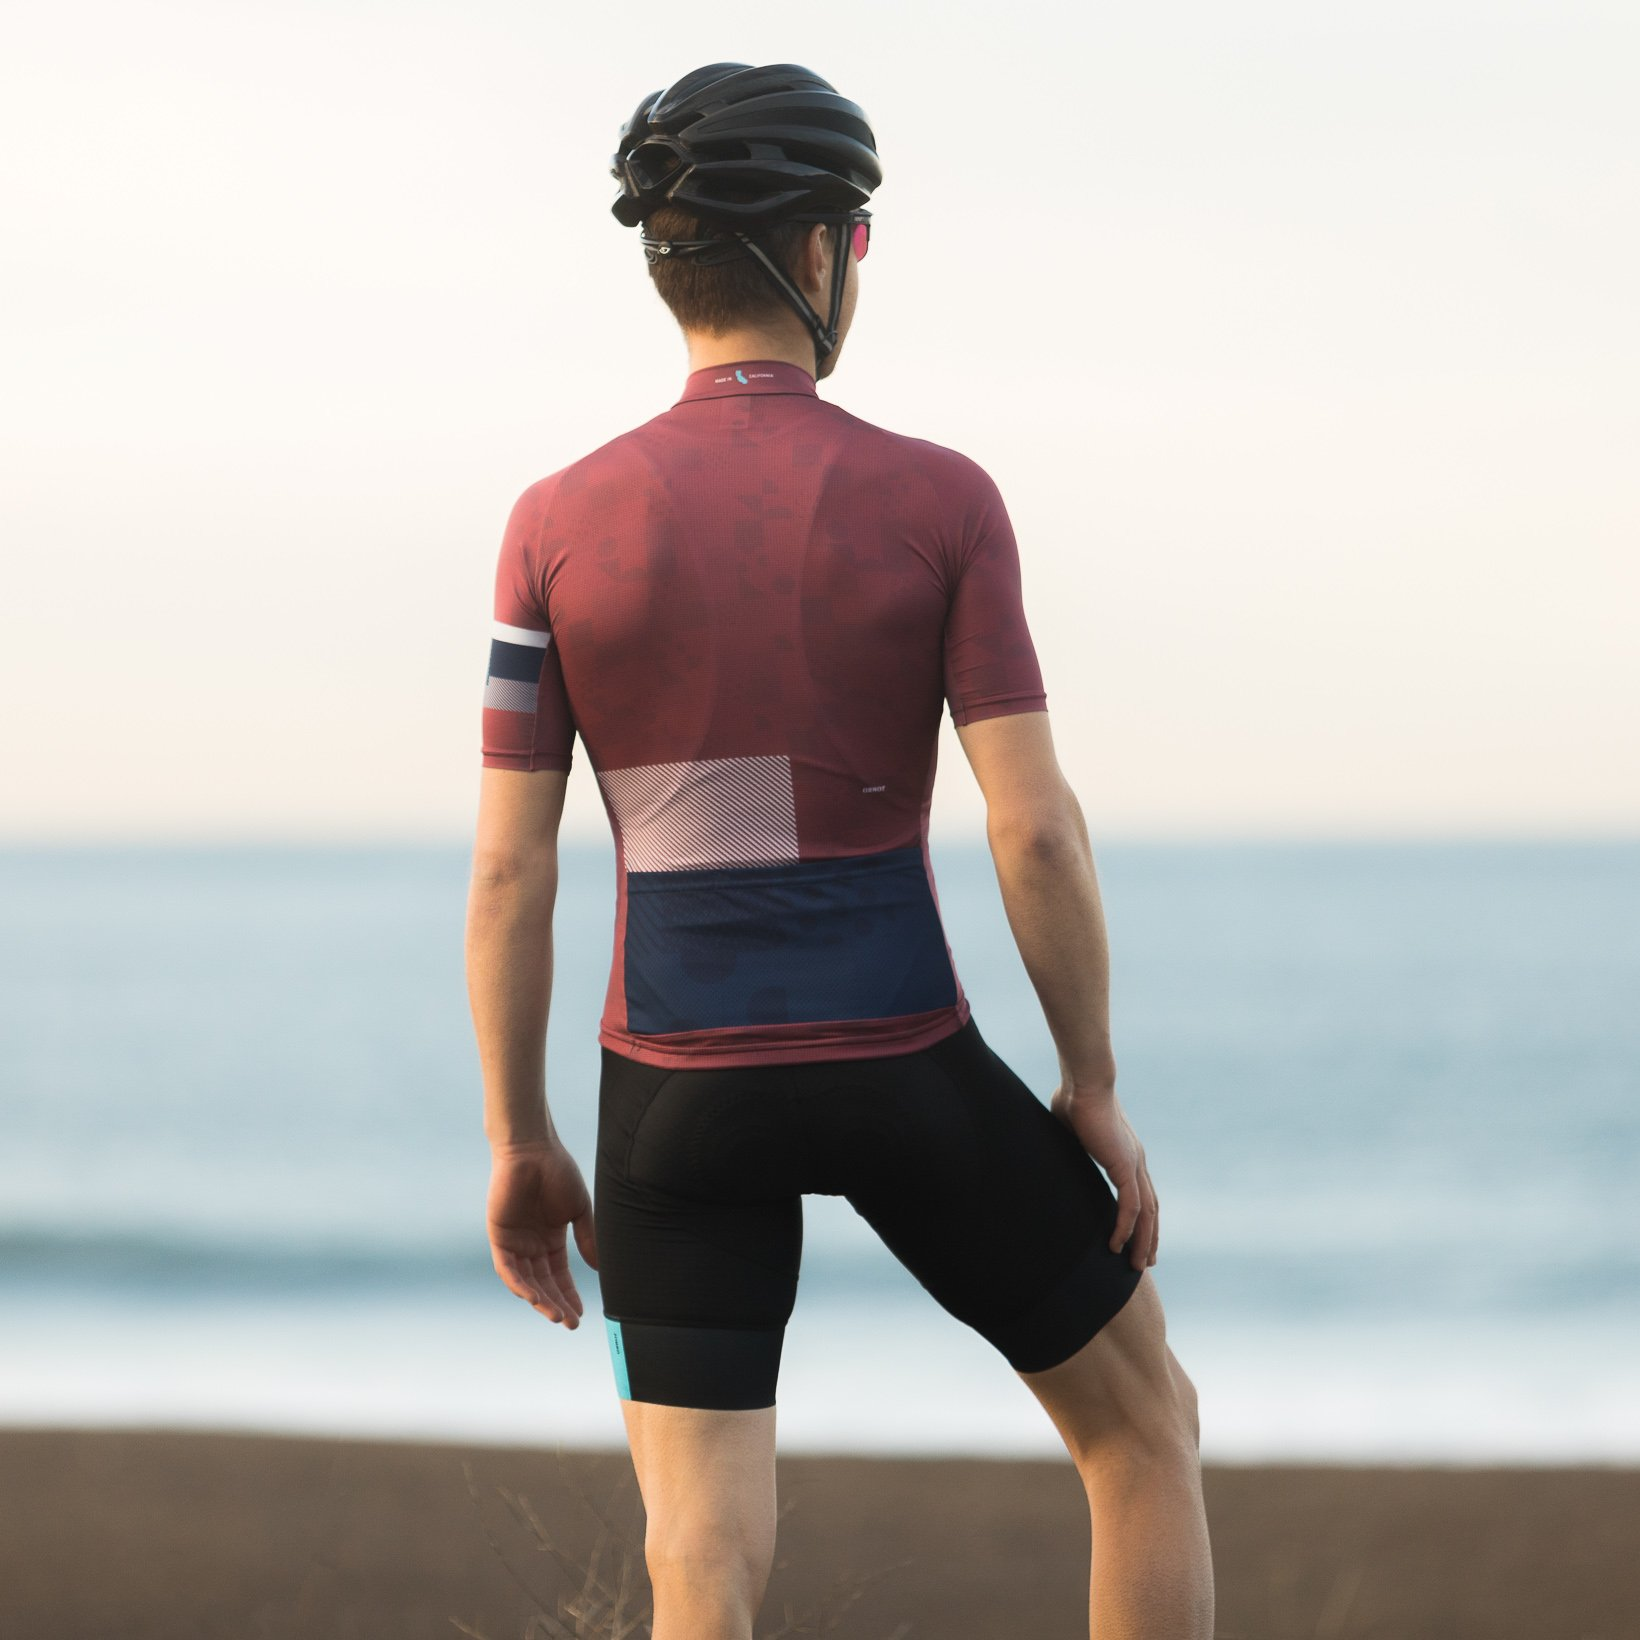 ornot house bib shorts code burgundy house jersey review